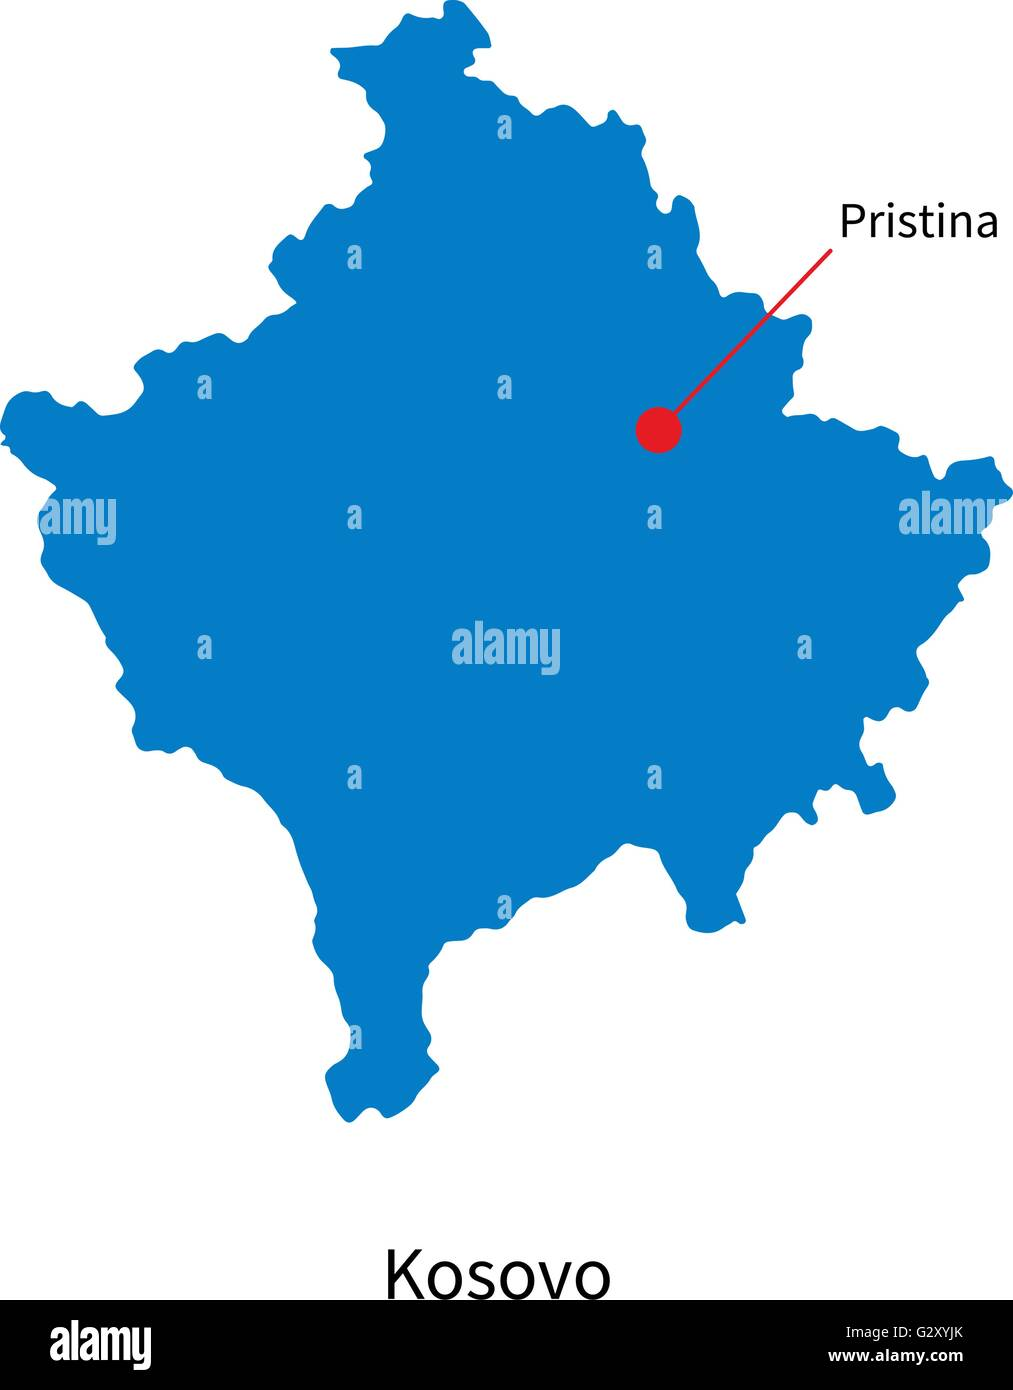 Detailed Vector Map Of Kosovo And Capital City Pristina Stock - pristina map